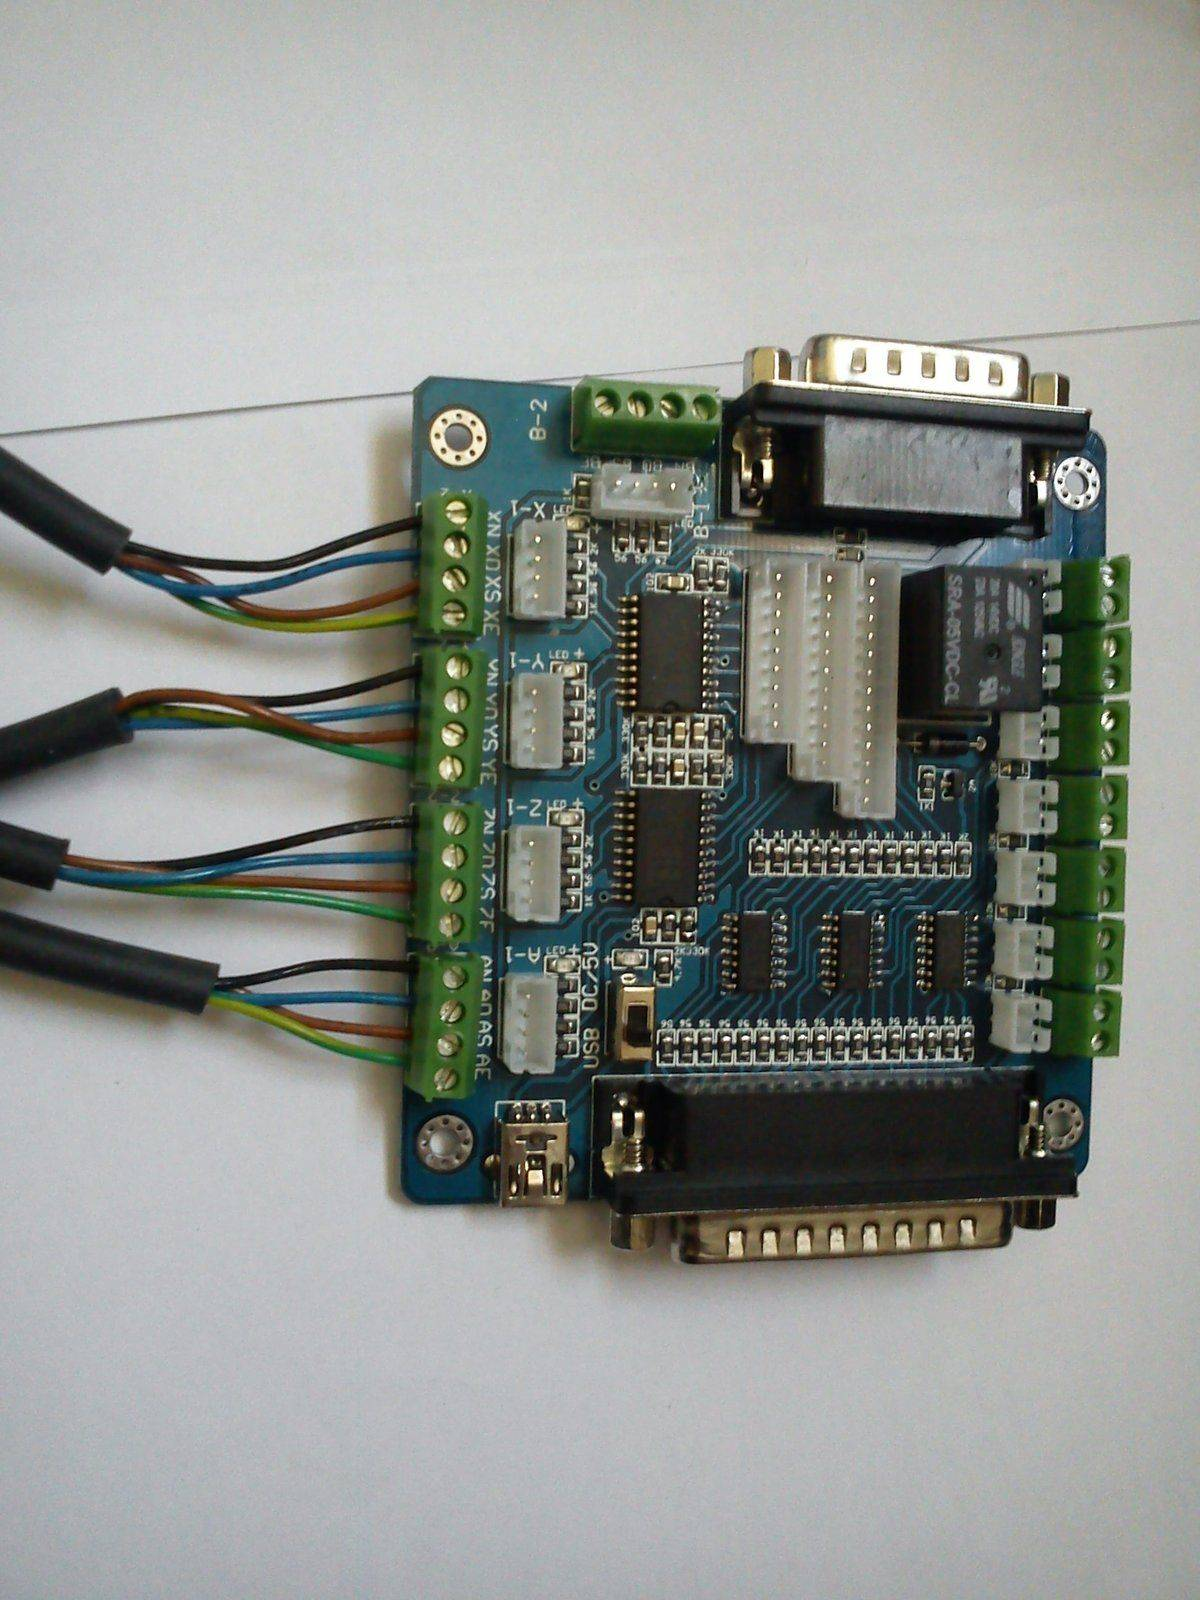 DSC00313.JPG